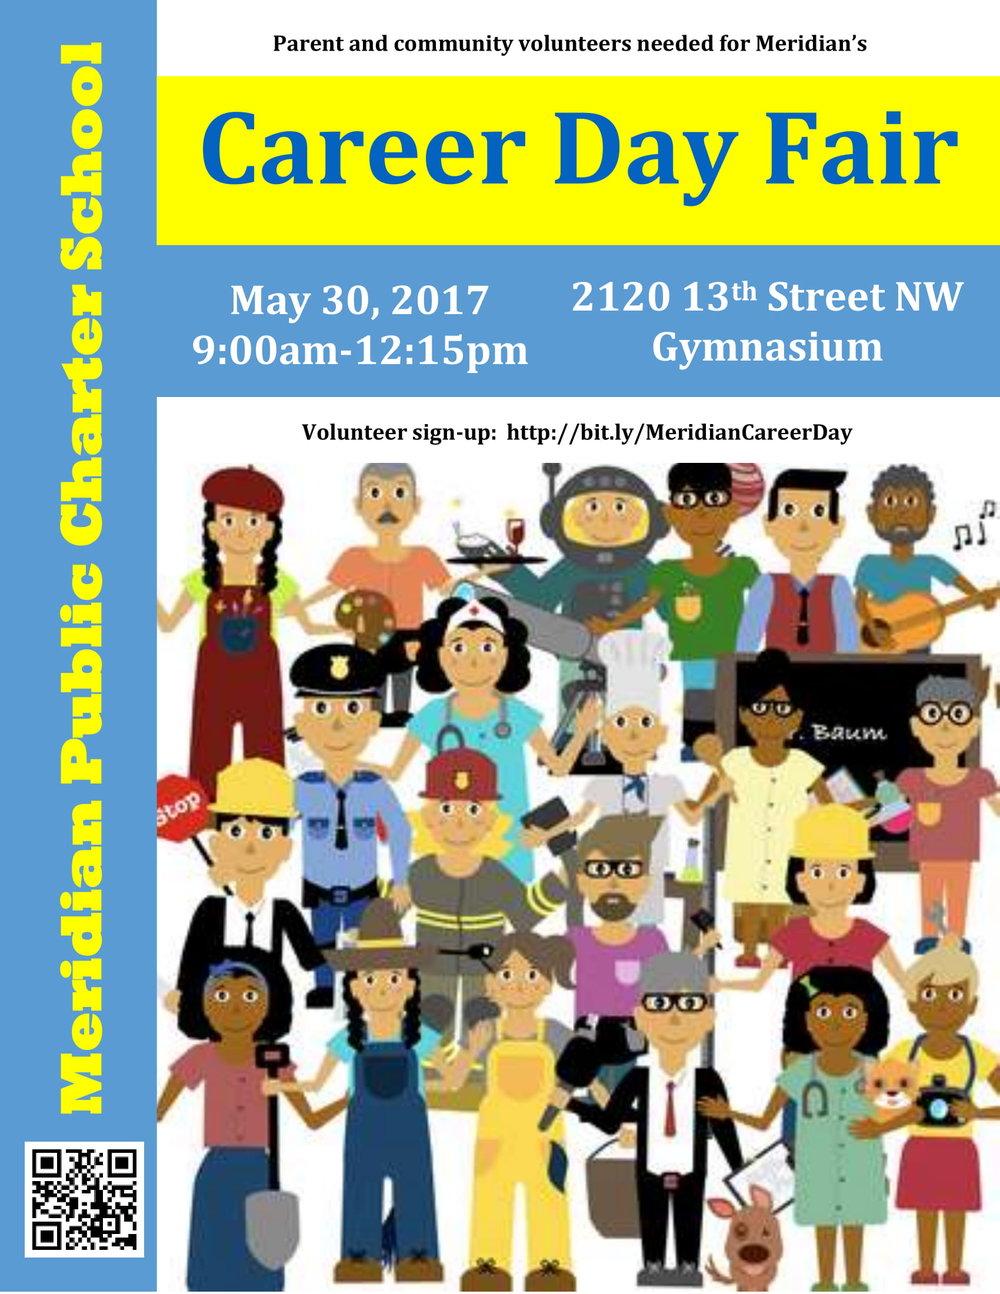 Career Day Fair Flyer (en)-1.jpg